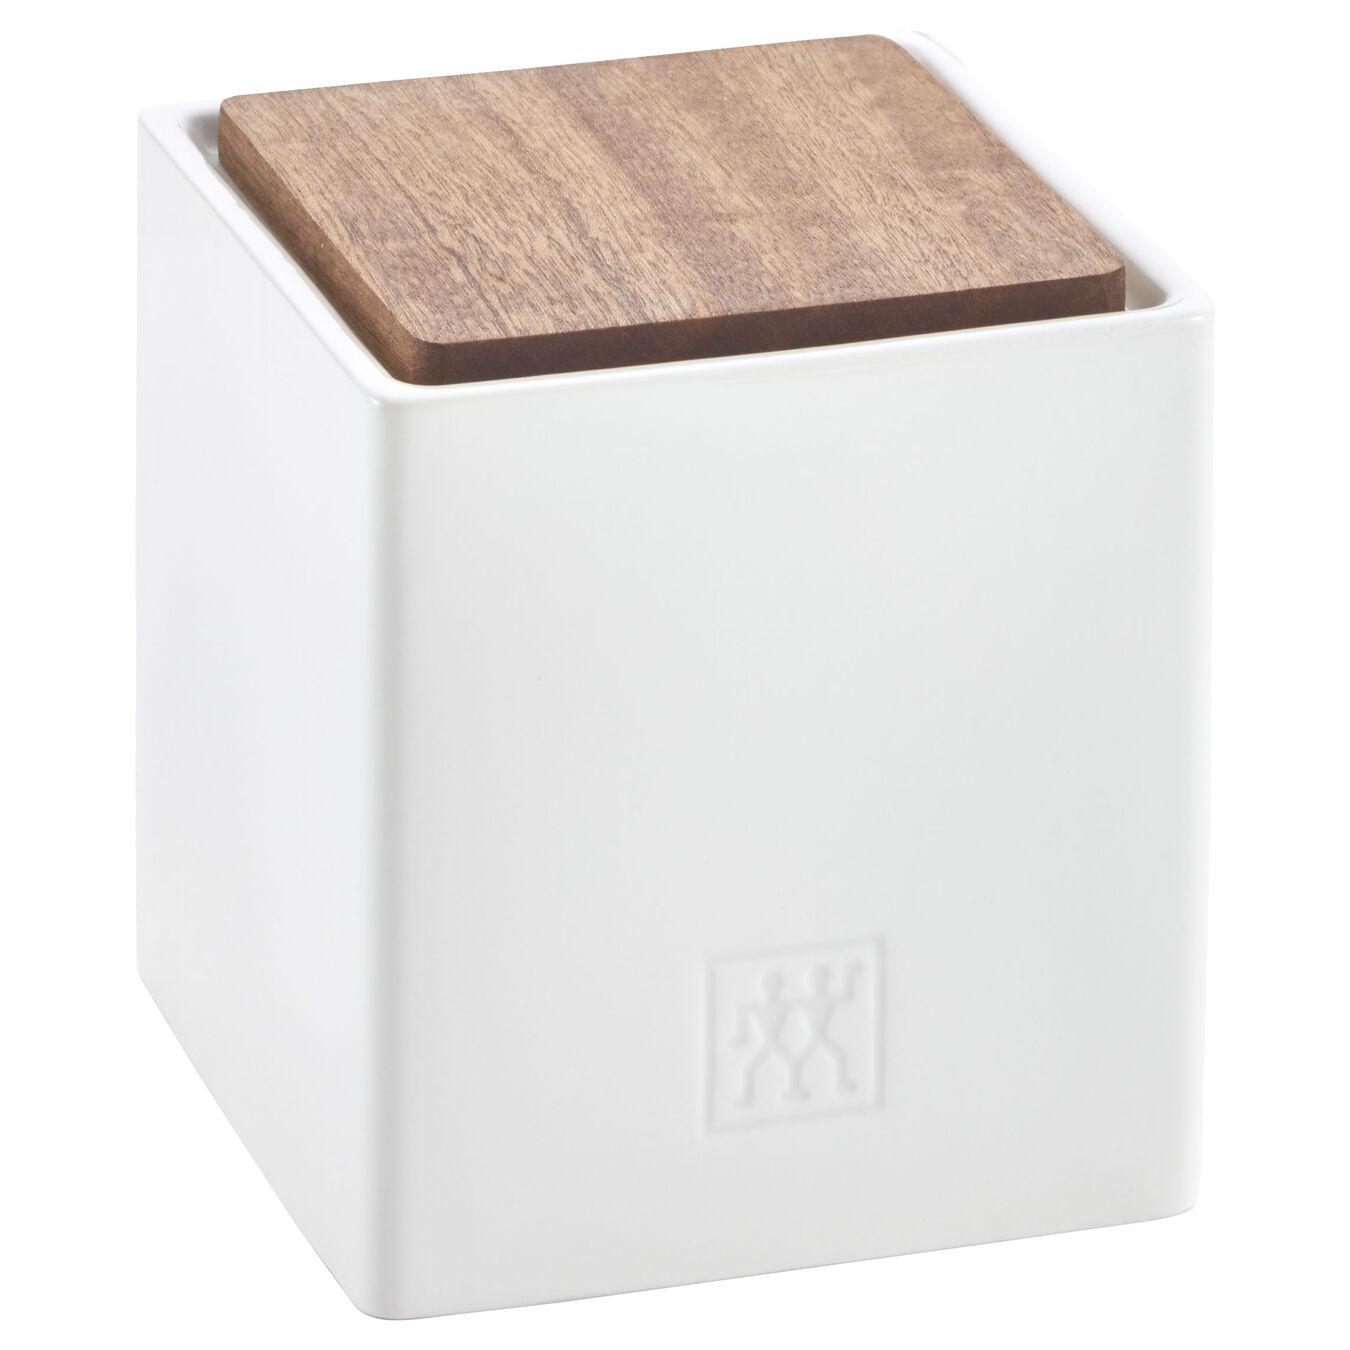 Ceramic 4-Piece storage box set,,large 7